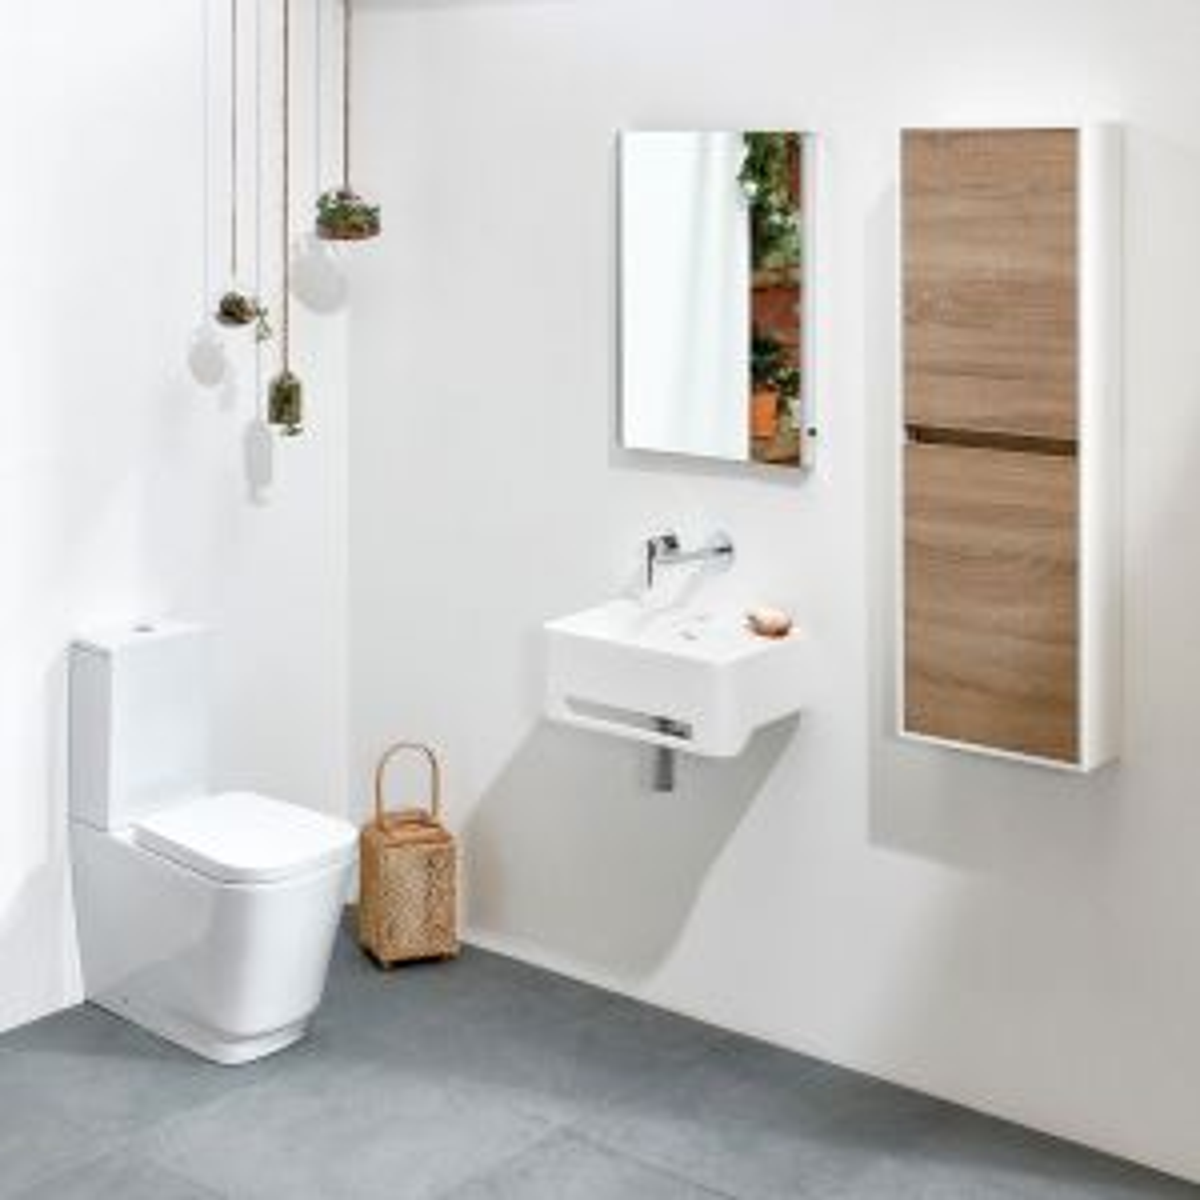 Frontline Cabanes Solid Cloakroom Basin 500mm Lifestyle